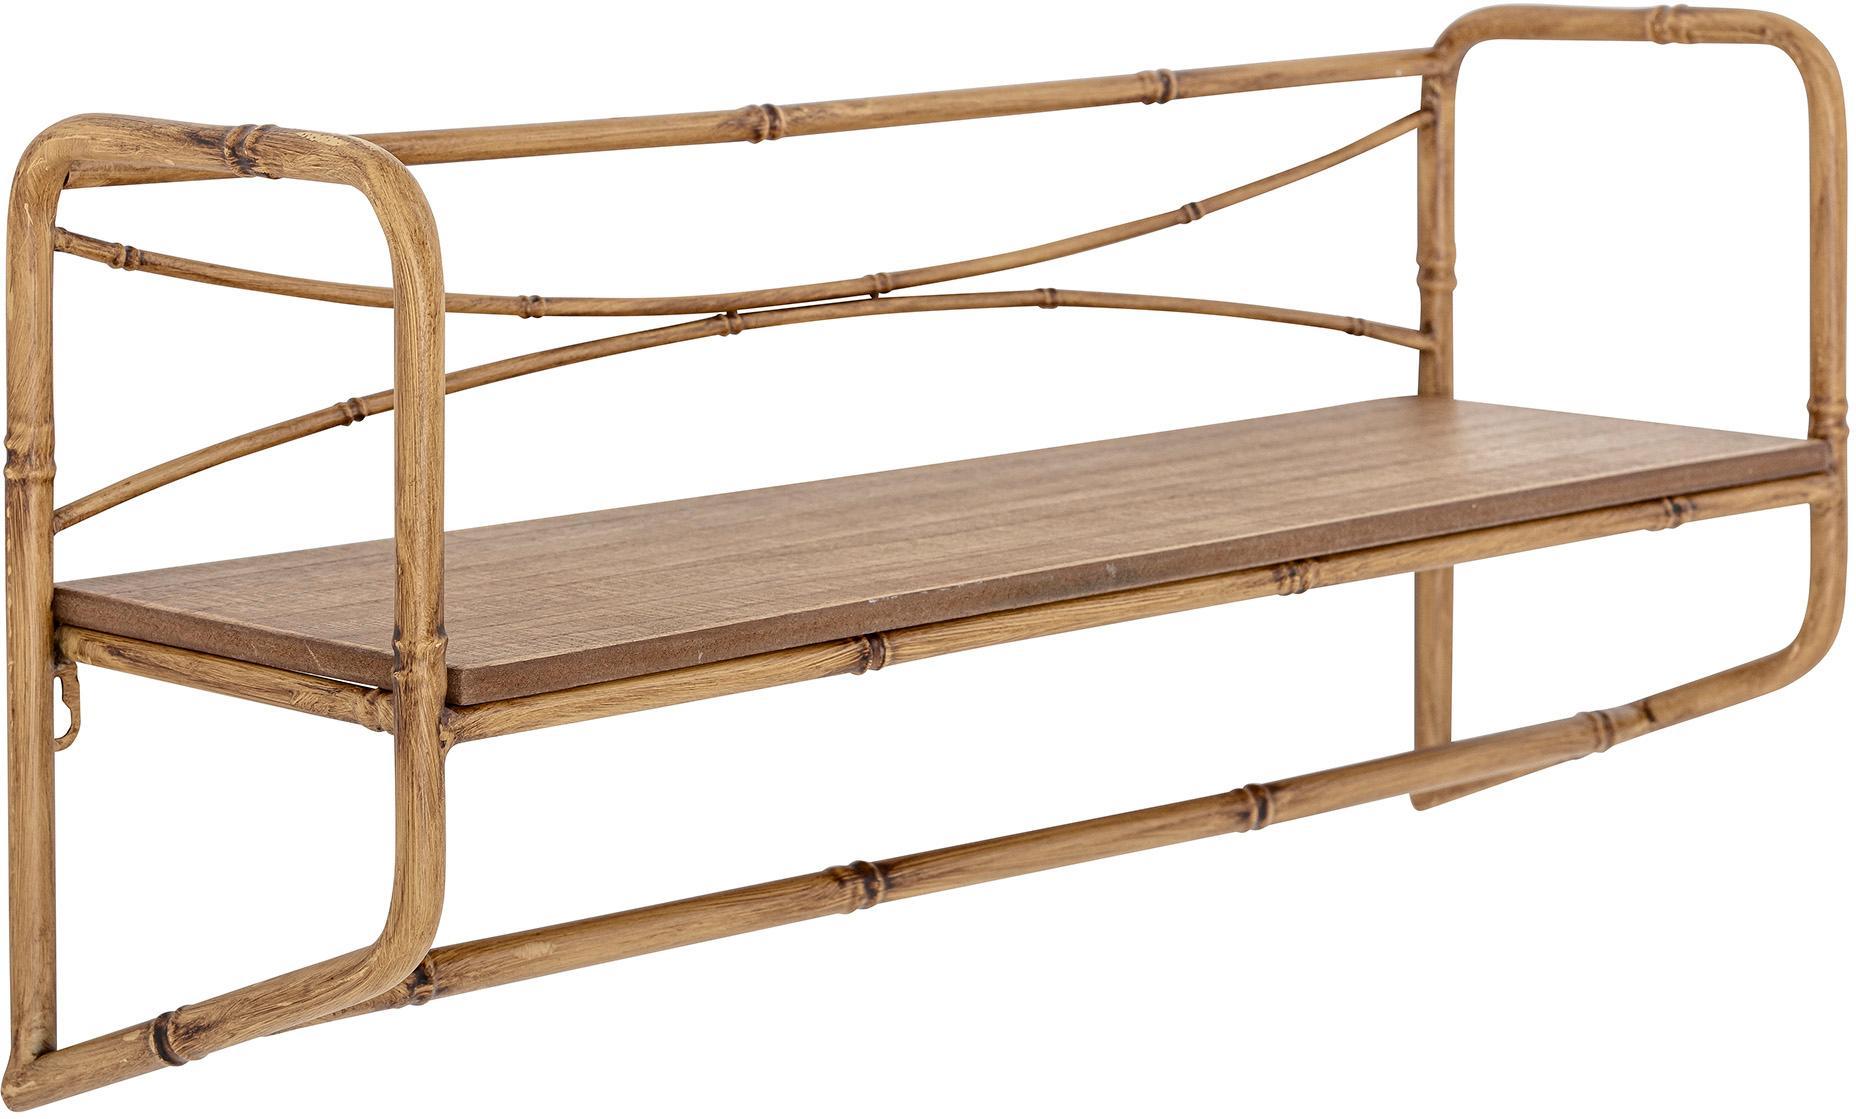 Wandplank Rod, Frame: riet, Plank: MDF, Bruin, 63 x 28 cm